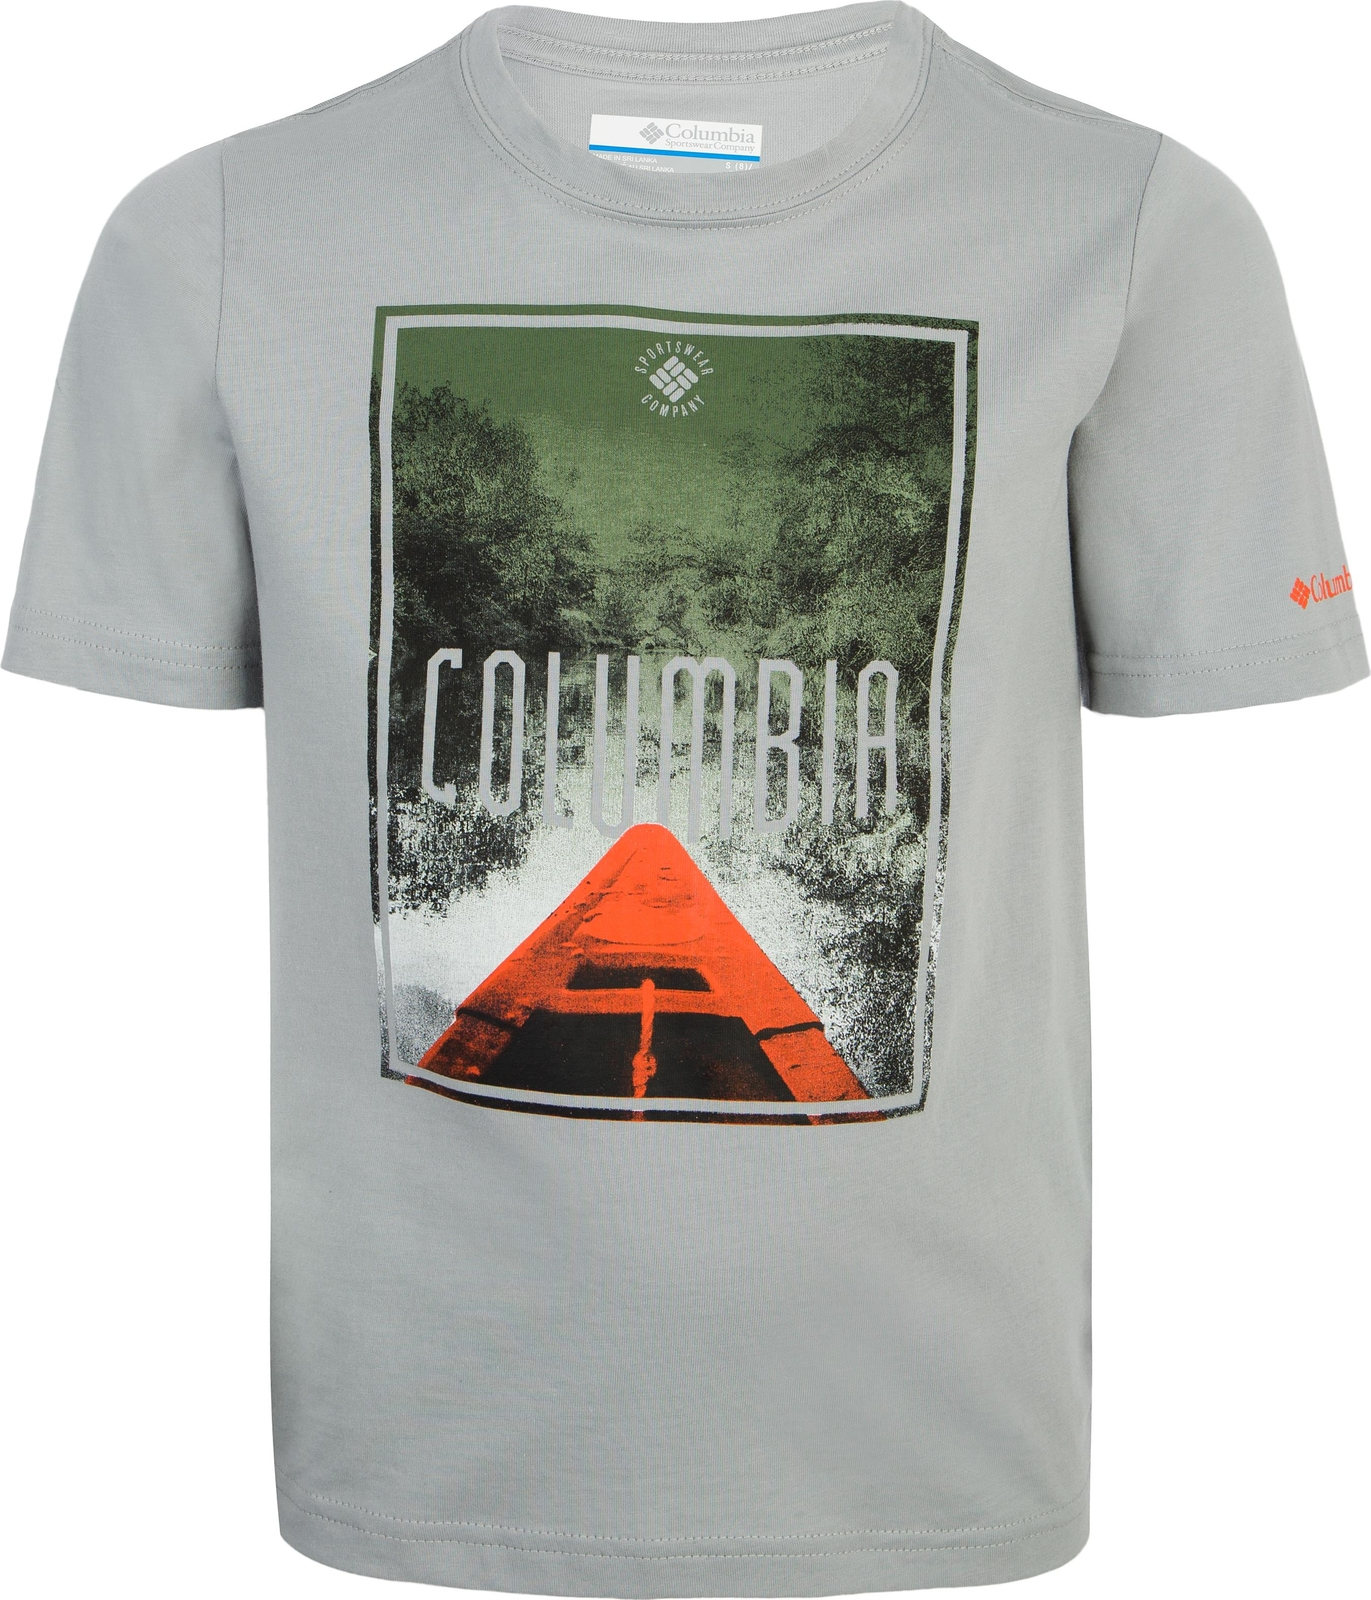 Футболка Columbia Camp Champ Short Sleeve Shirt barnard s beautiful broken things